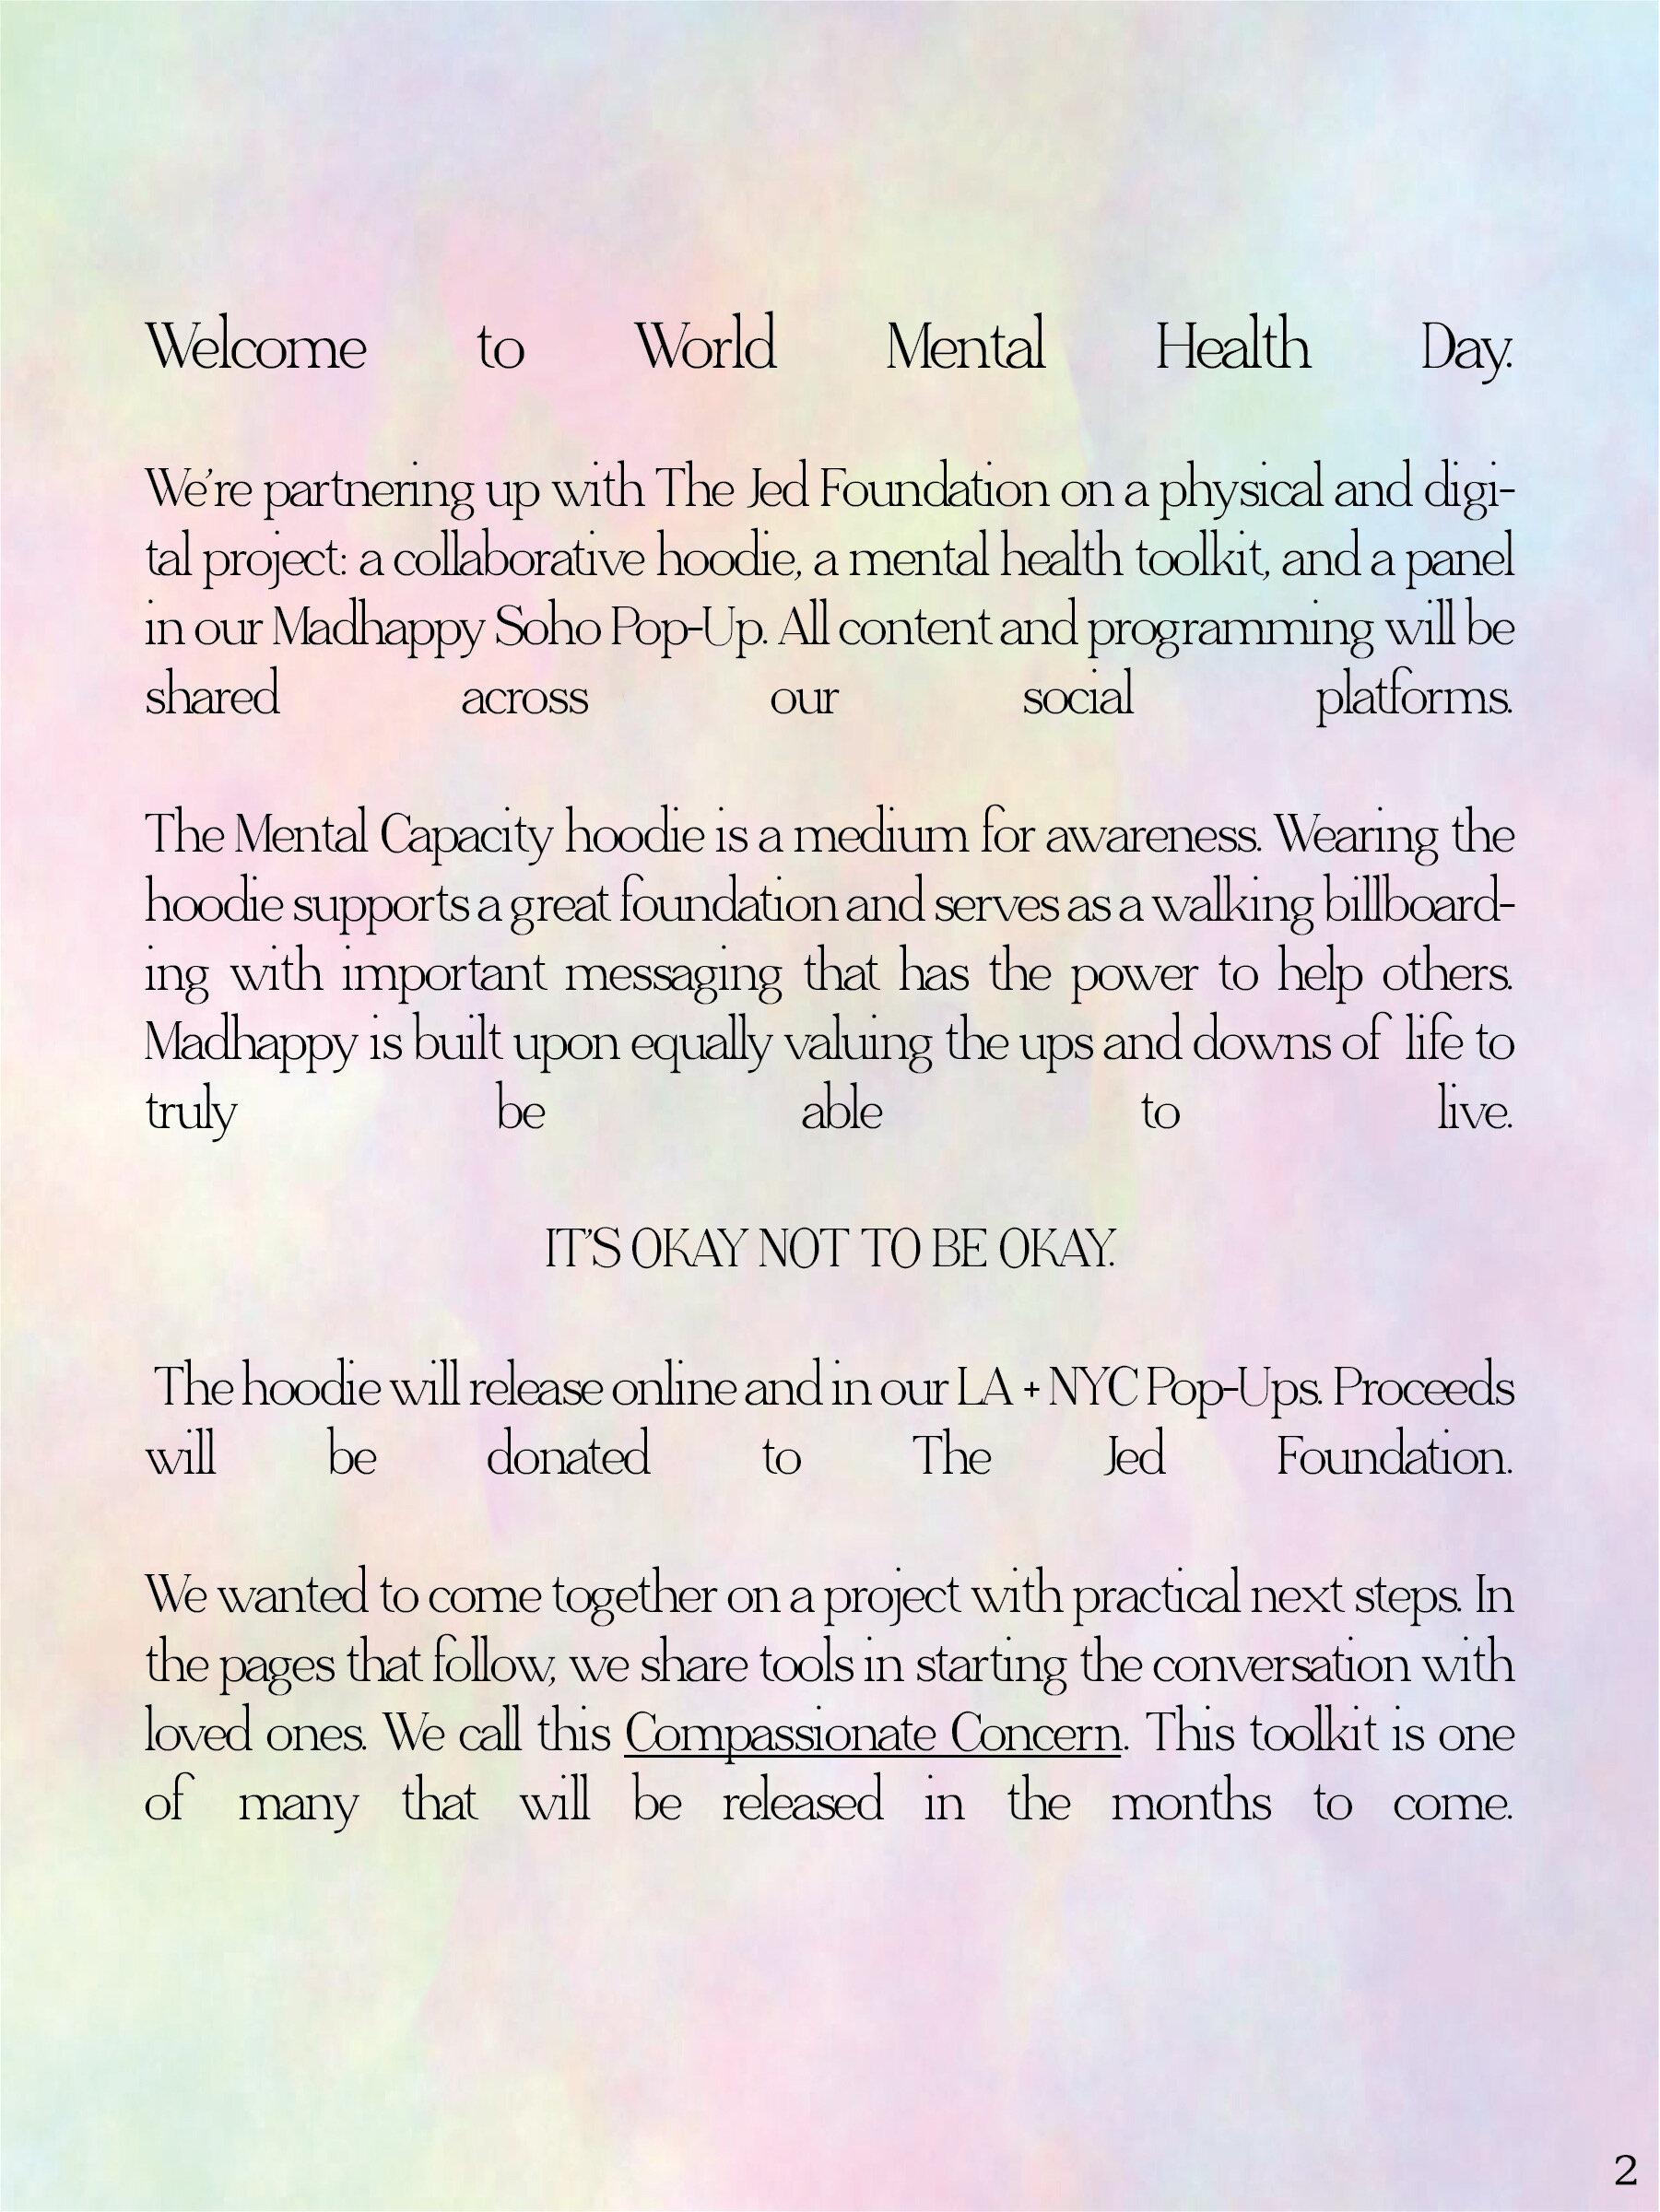 World Mental Health Day Pamphlet-02.jpeg